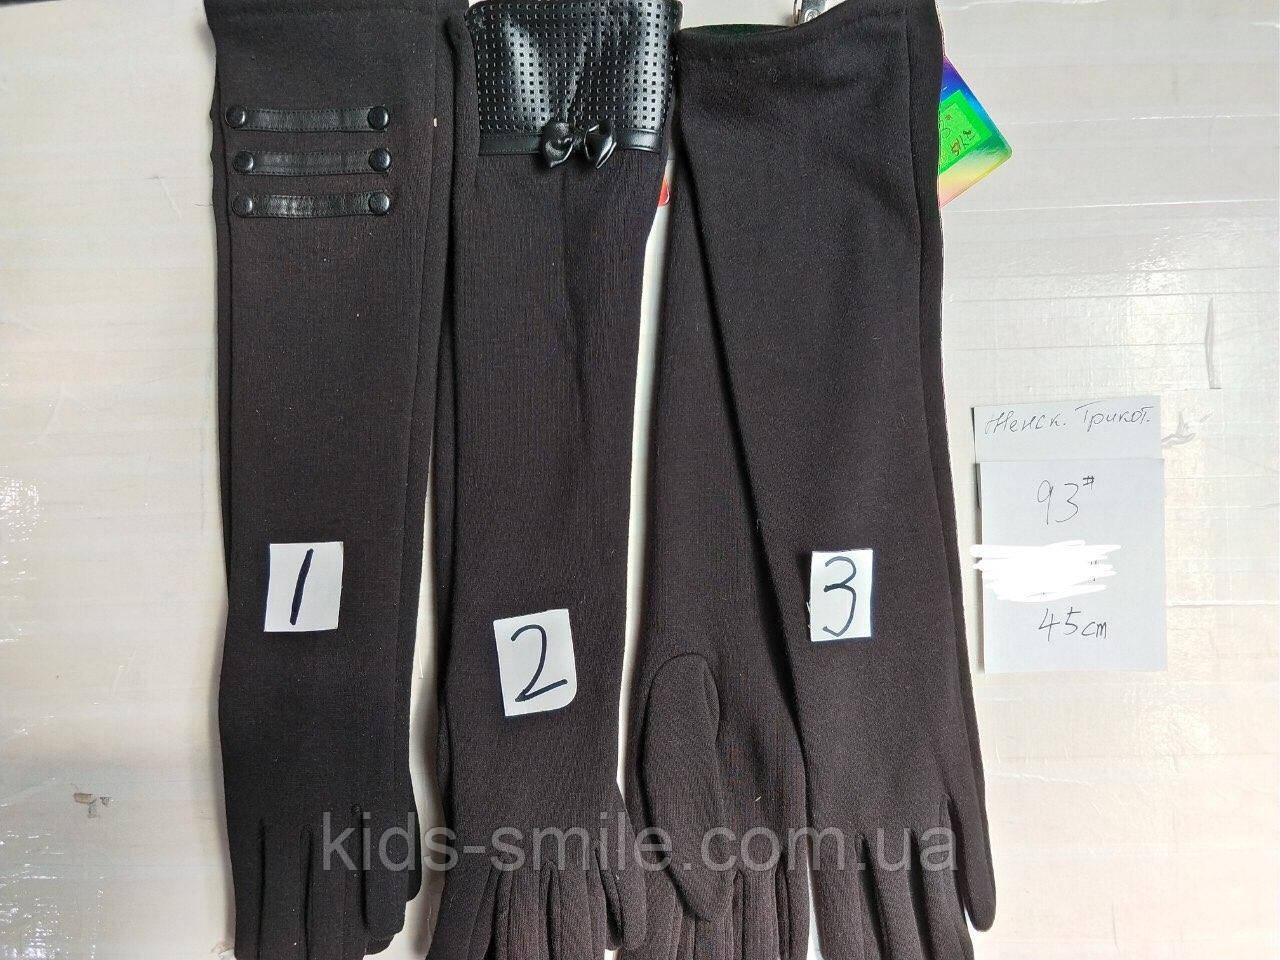 Перчатки женские до локтей ( трикотаж на флисе )